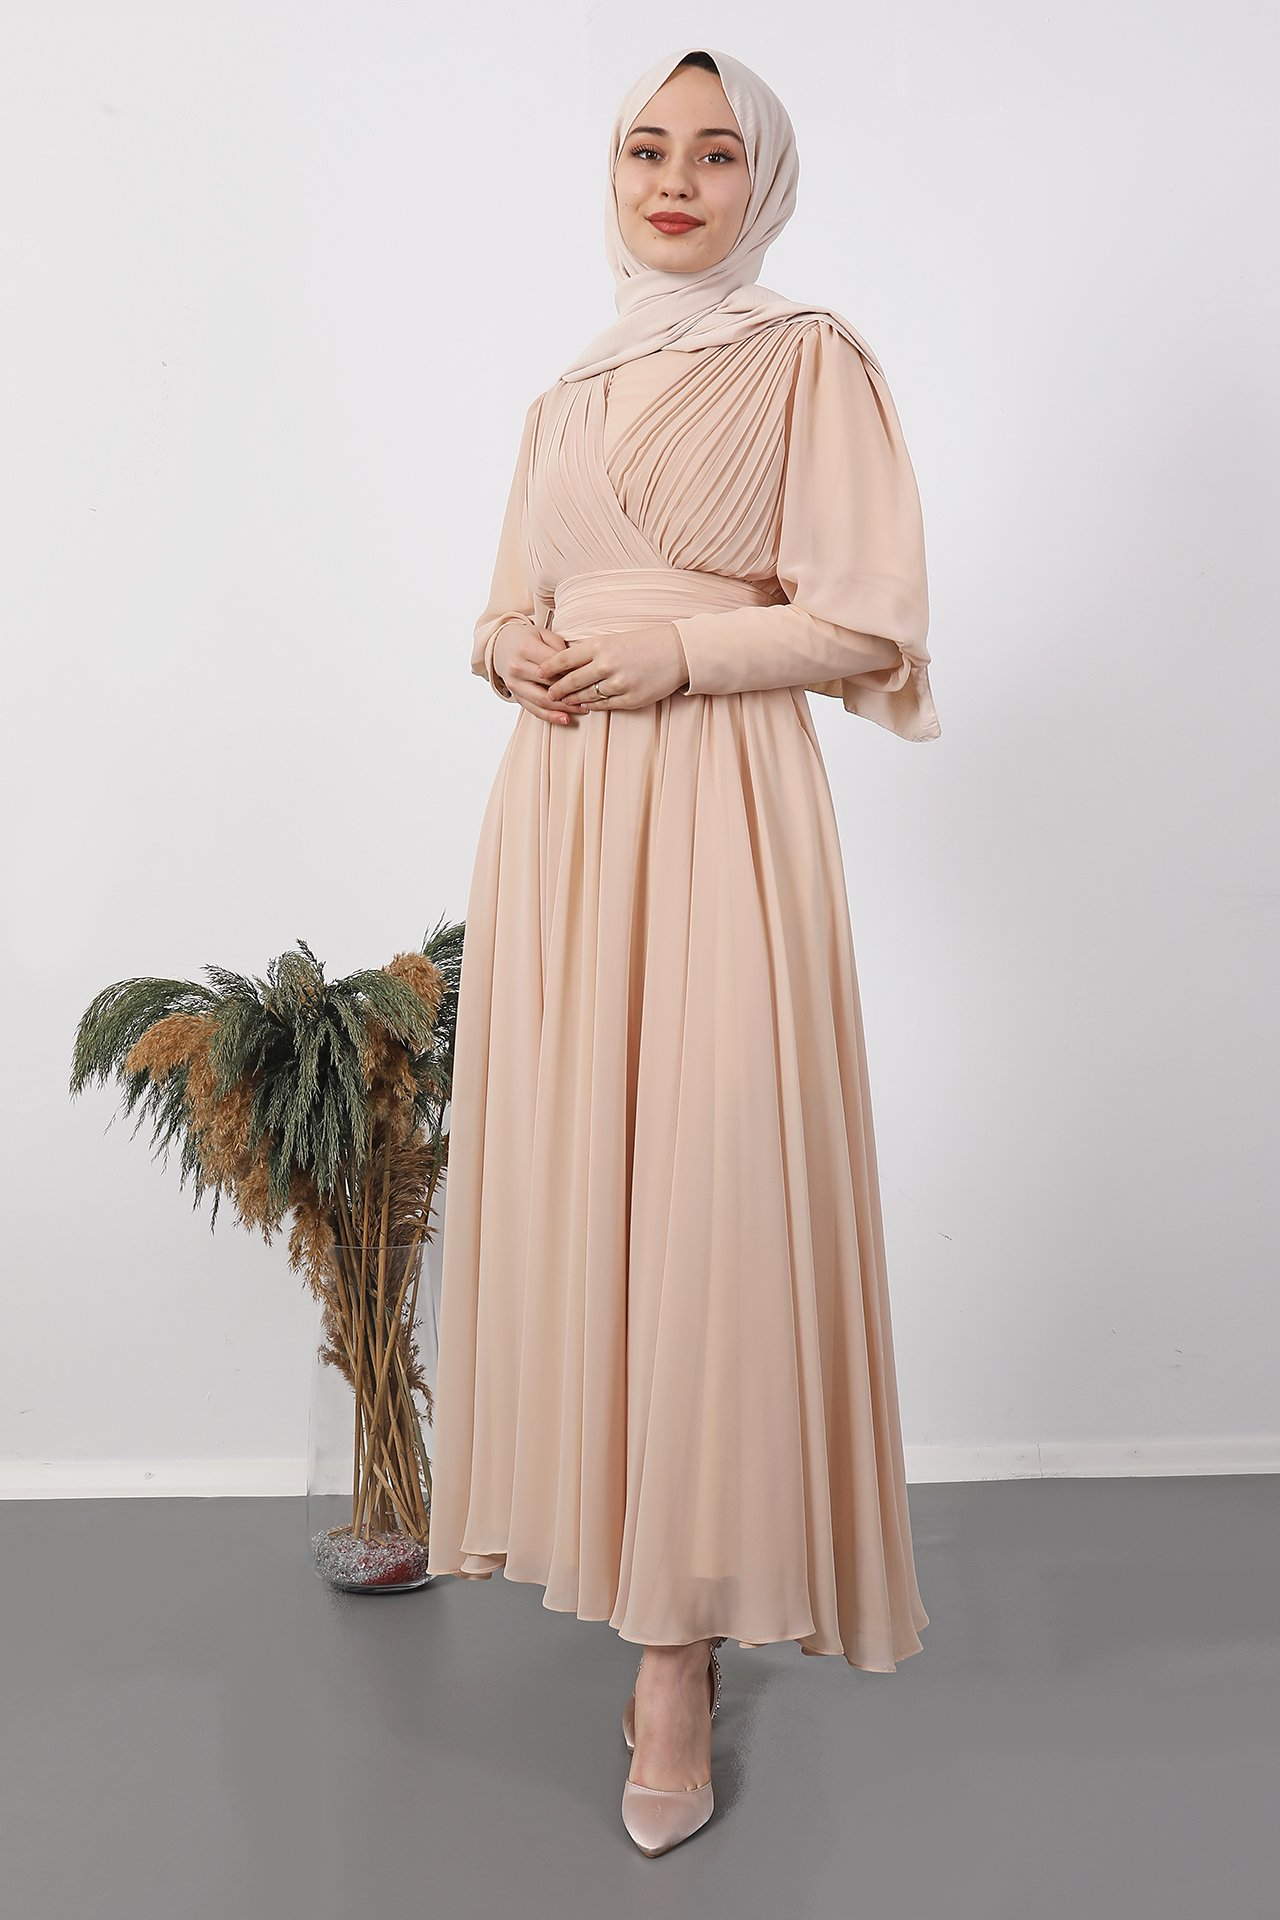 GİZAGİYİM - Kol Manşetli Piliseli Elbise Krem